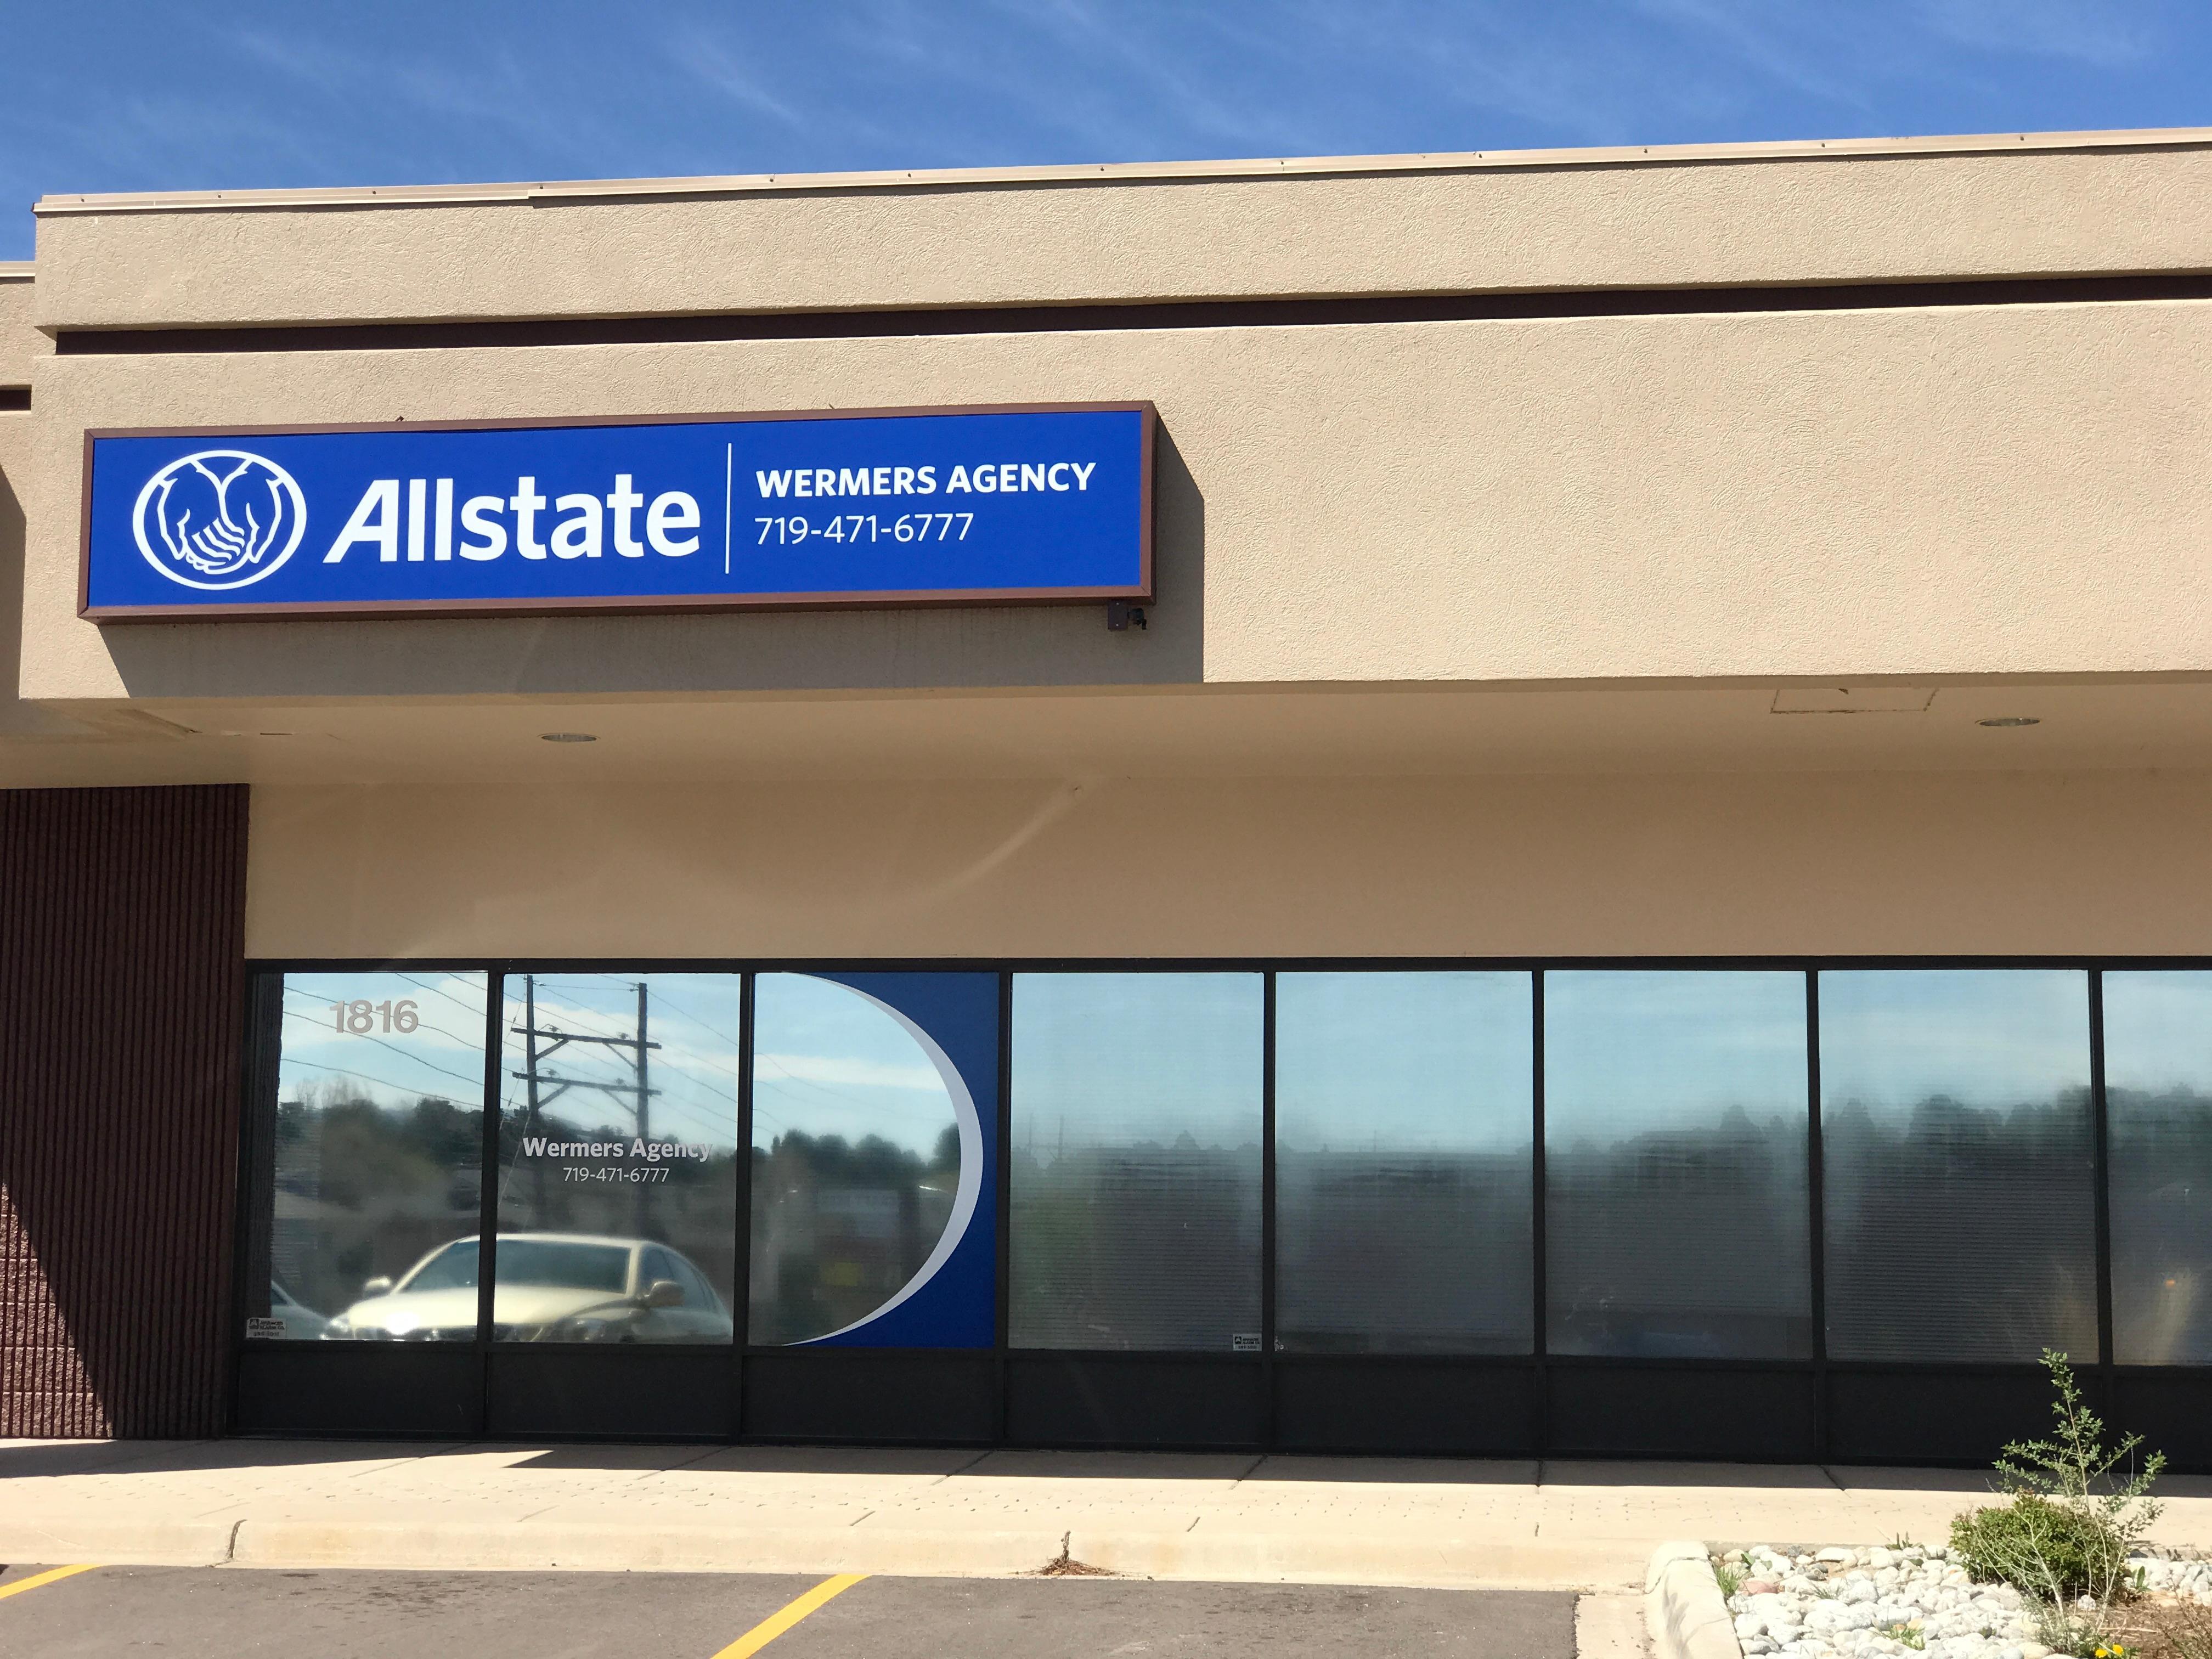 Wermers Agency Inc: Allstate Insurance